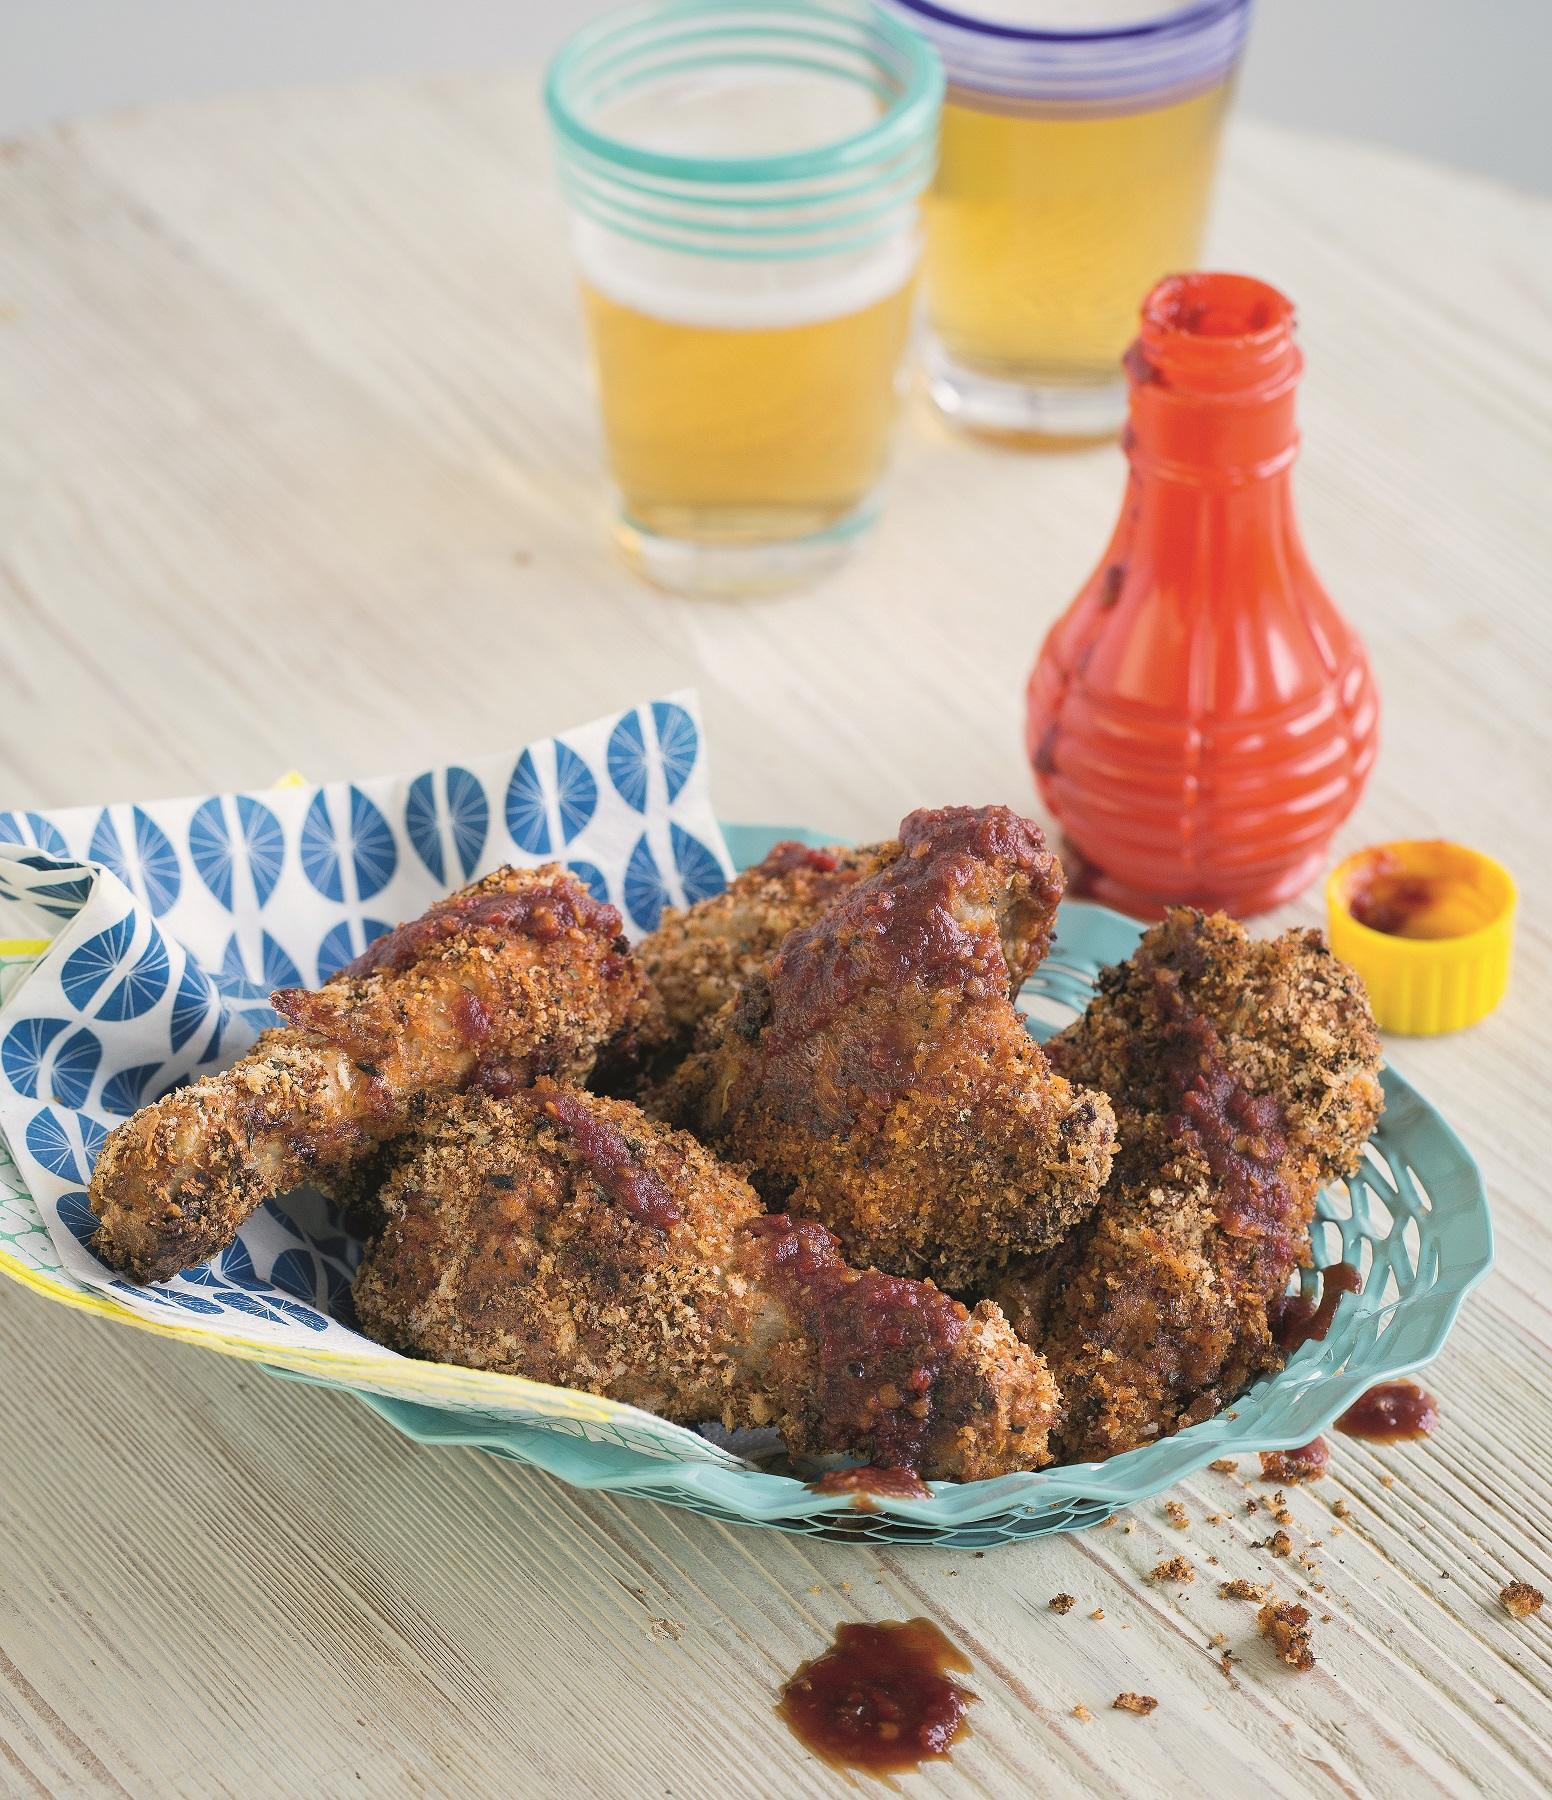 Mr. Singhs Southern baked chicken.jpg